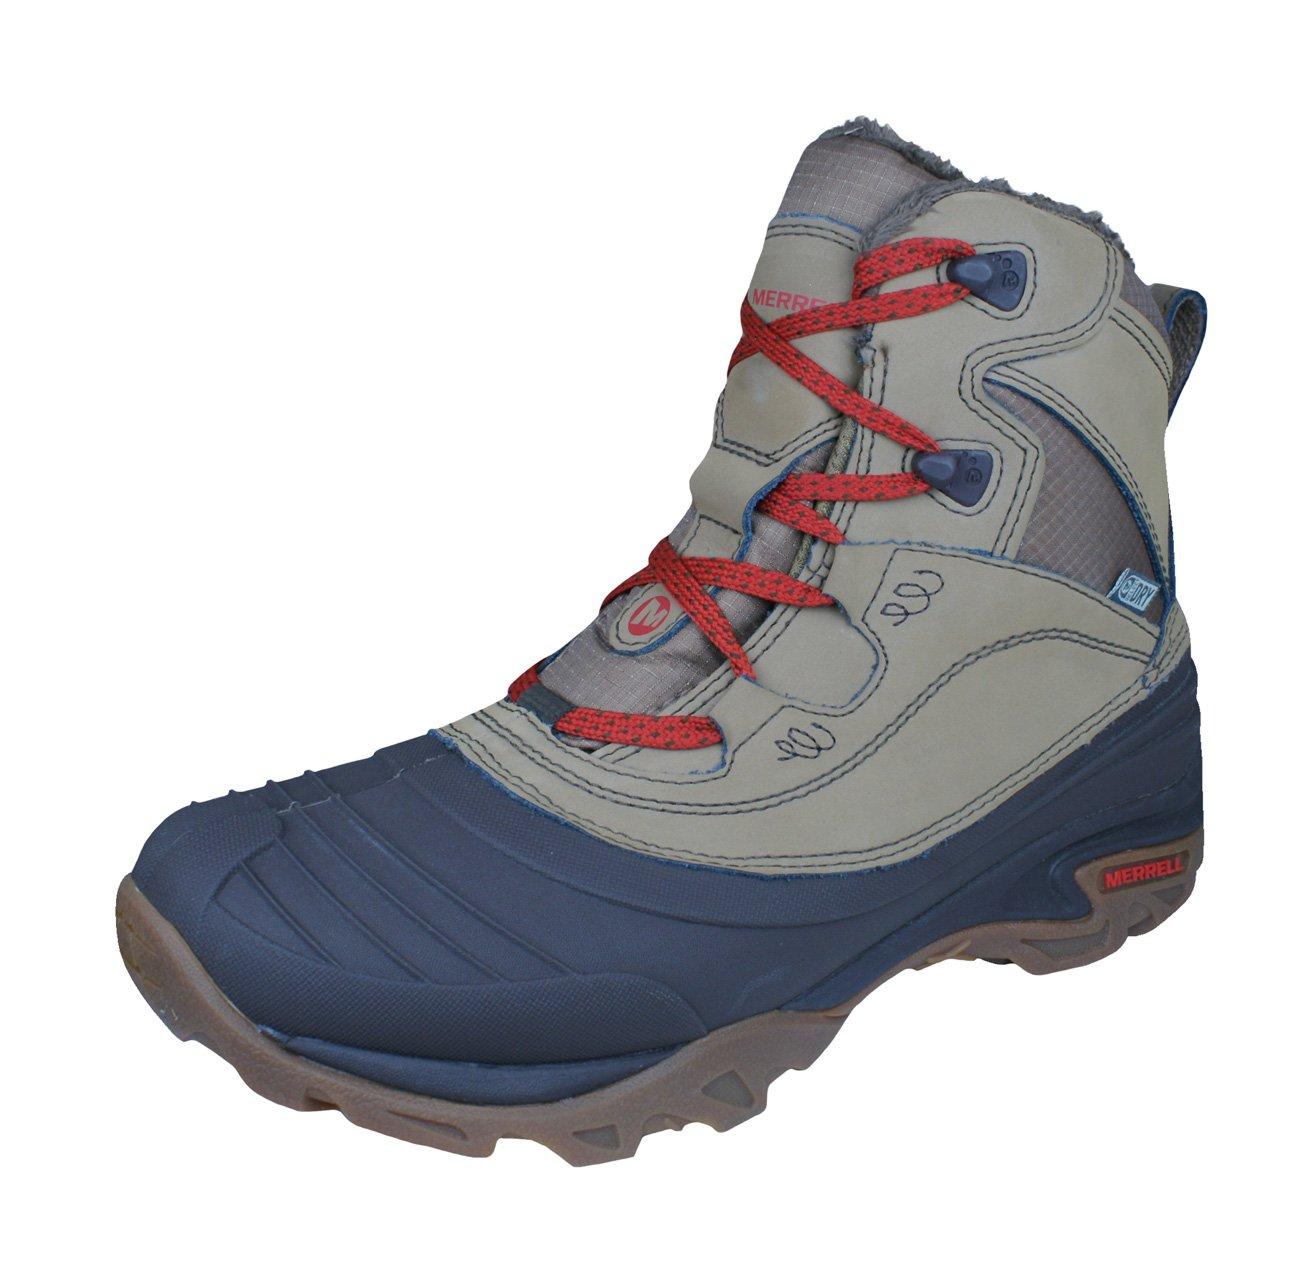 Merrell Snowbound Mid Waterproof Womens Boots - Black-Tan-6